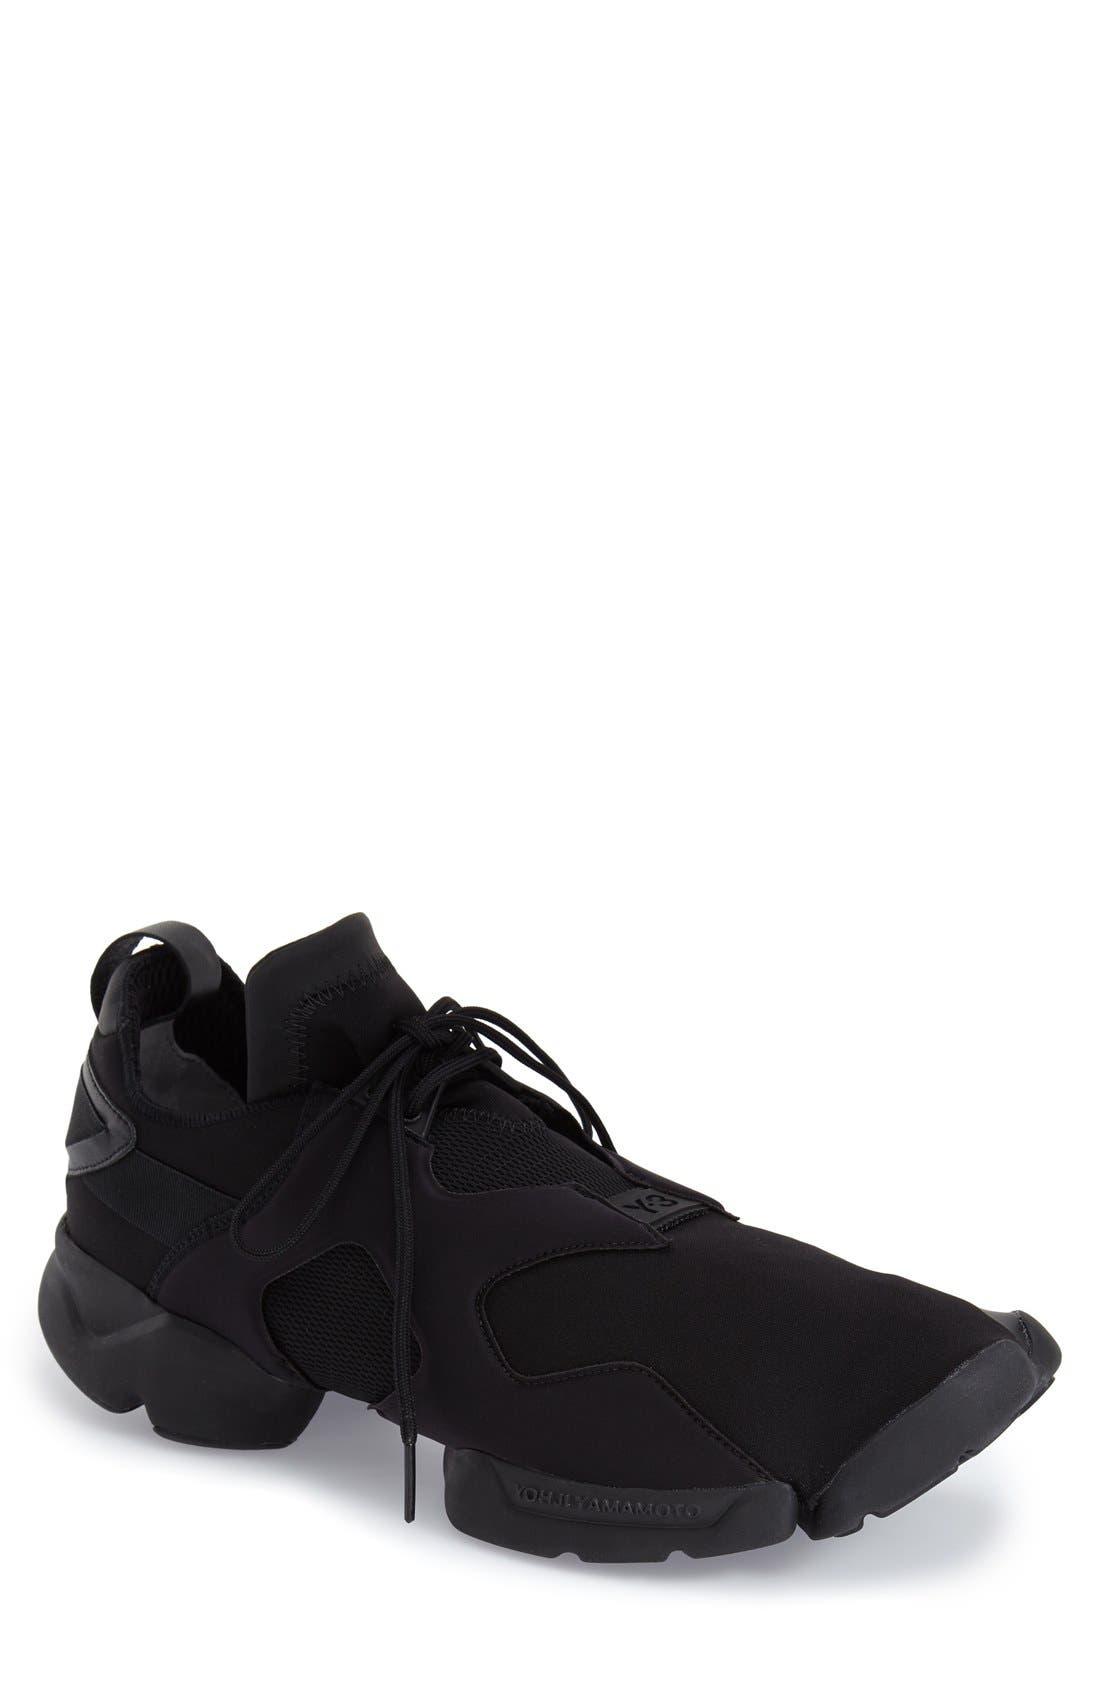 Main Image - Y-3 'Kohna' Low-Top Sneaker (Men)